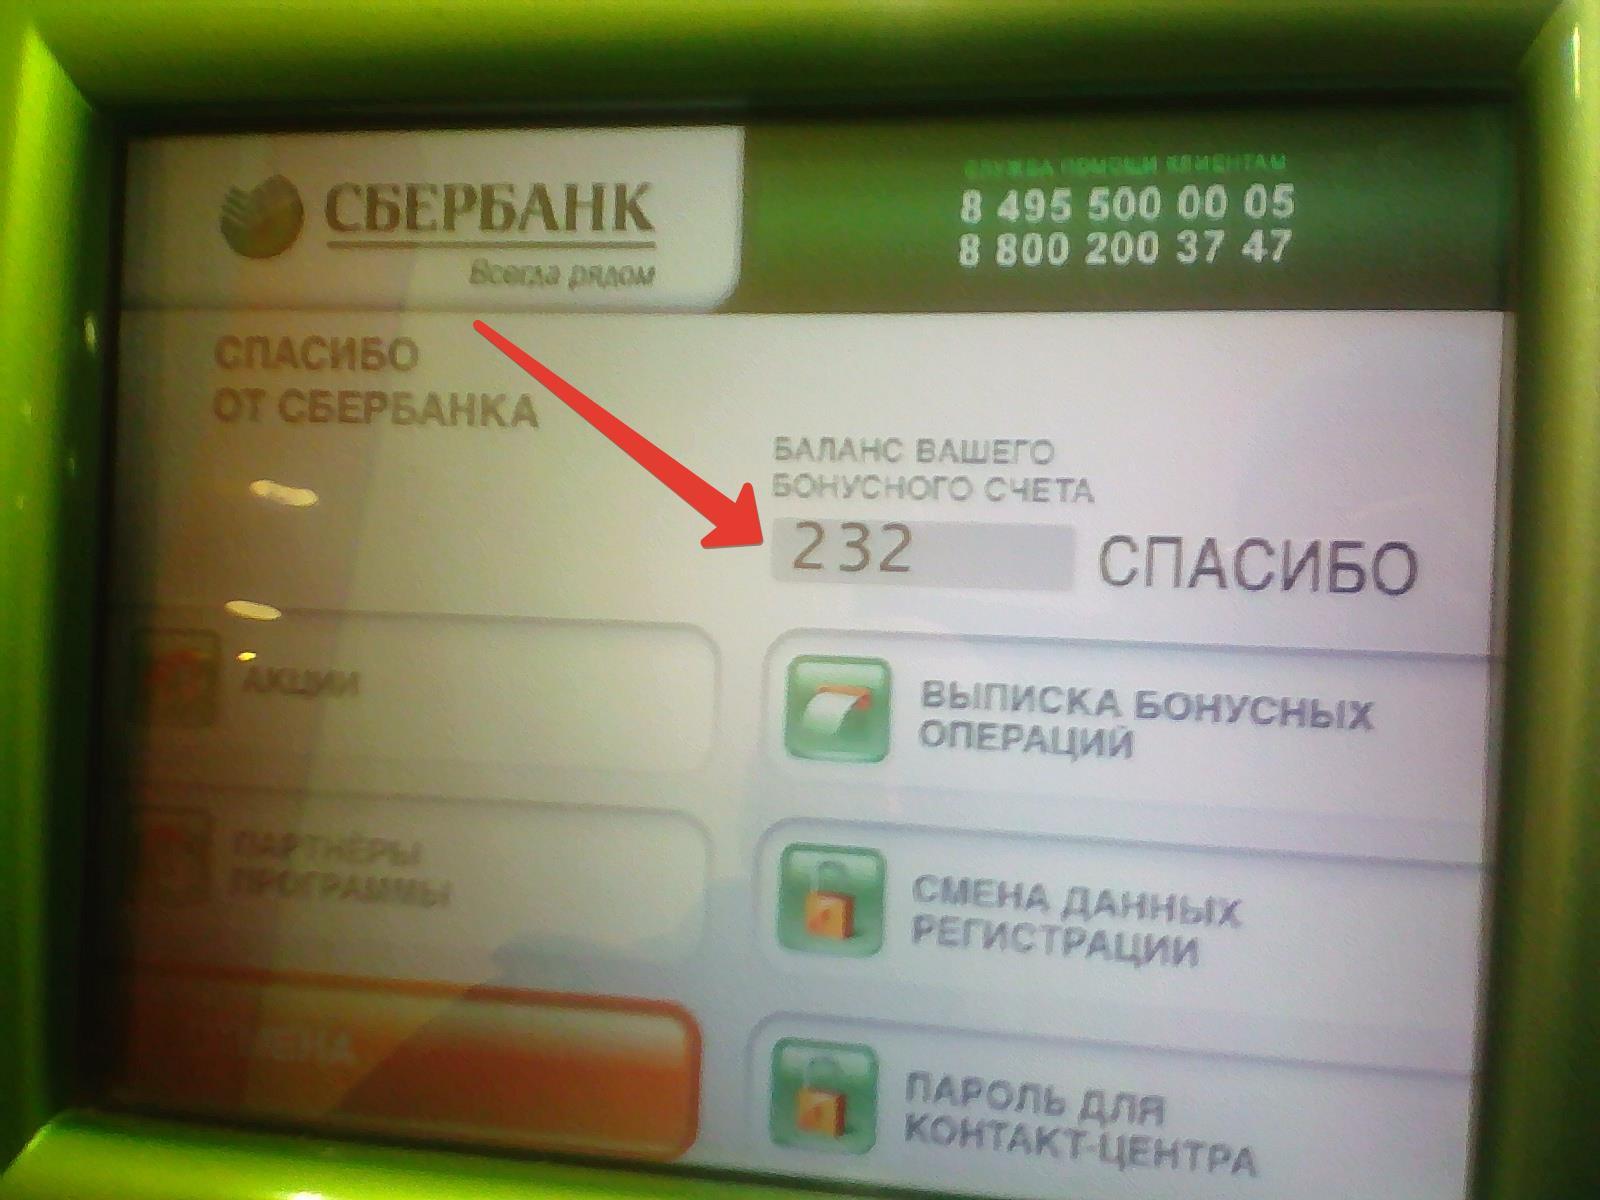 bankomatbalans.jpg